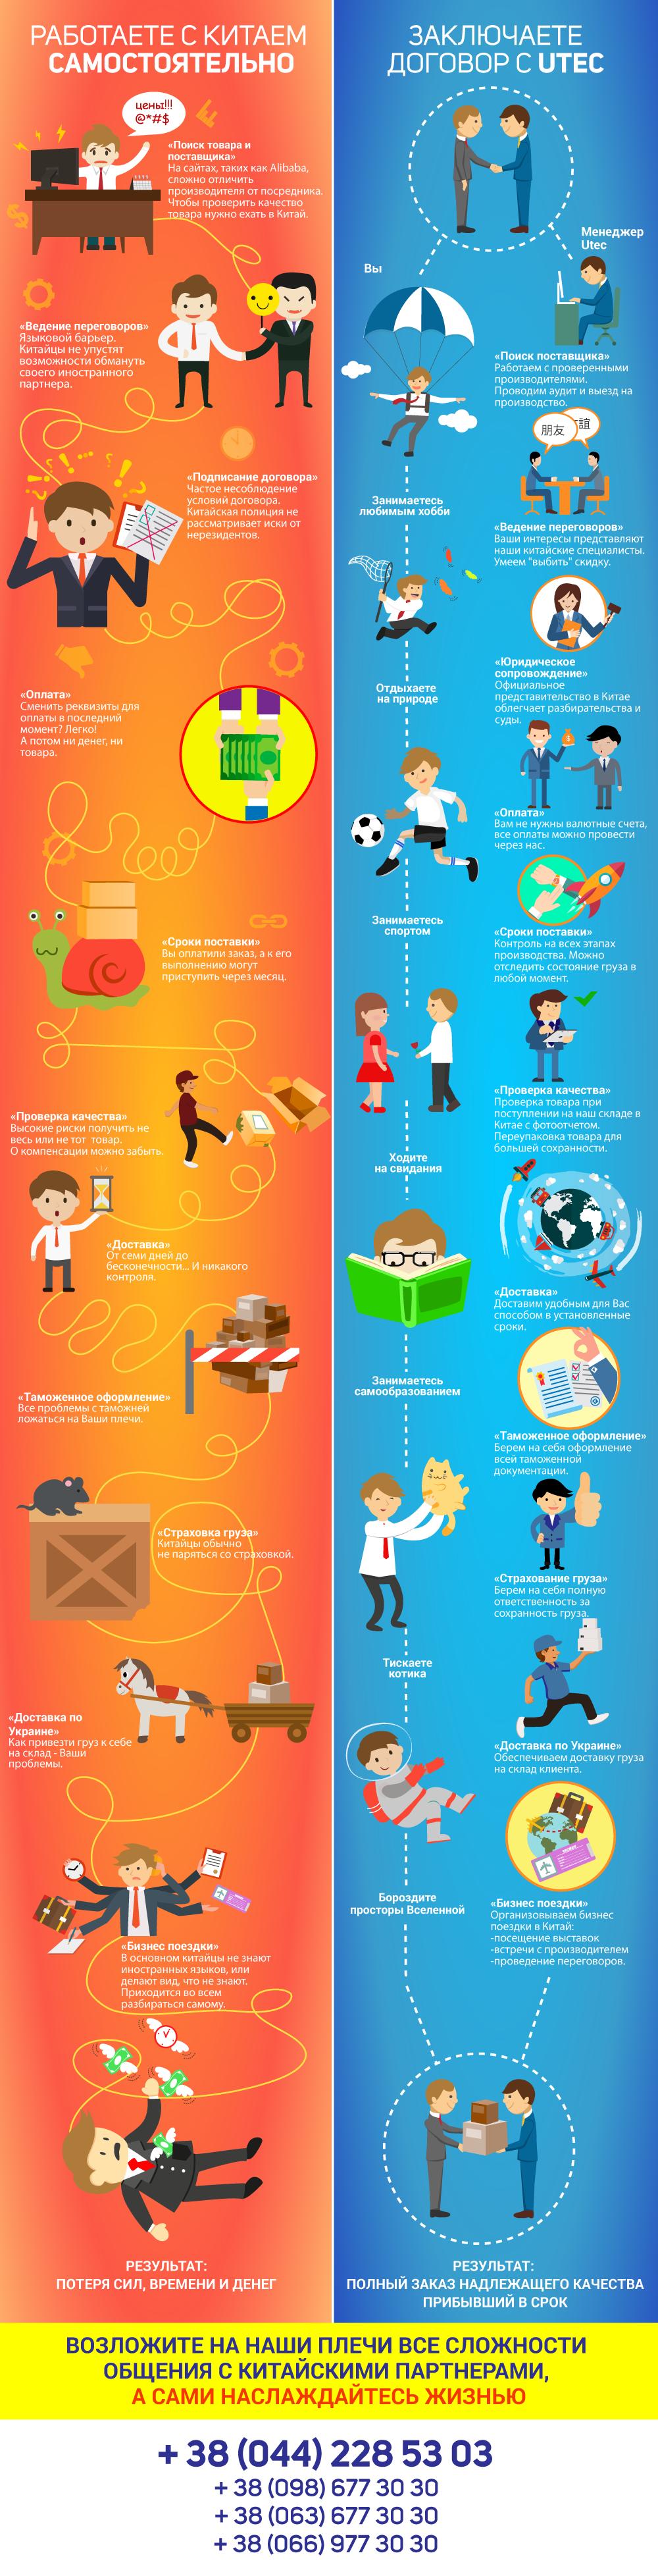 infographic_sait_1000